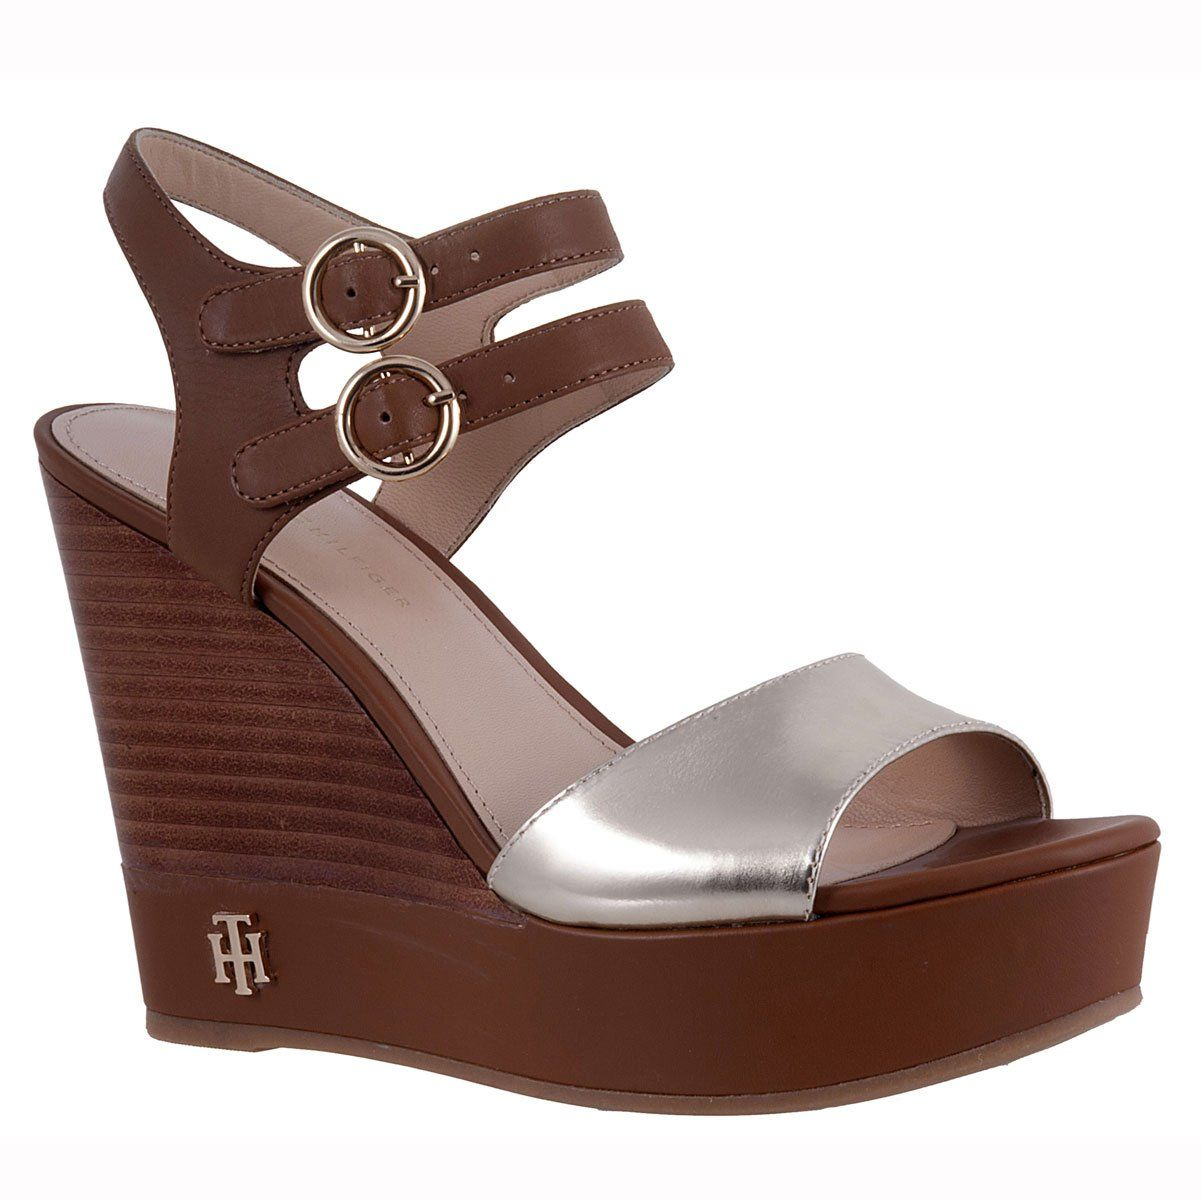 SANDALIA TOMMY HILFIGER Z Zapatos De Cuña 09c6609a3d0